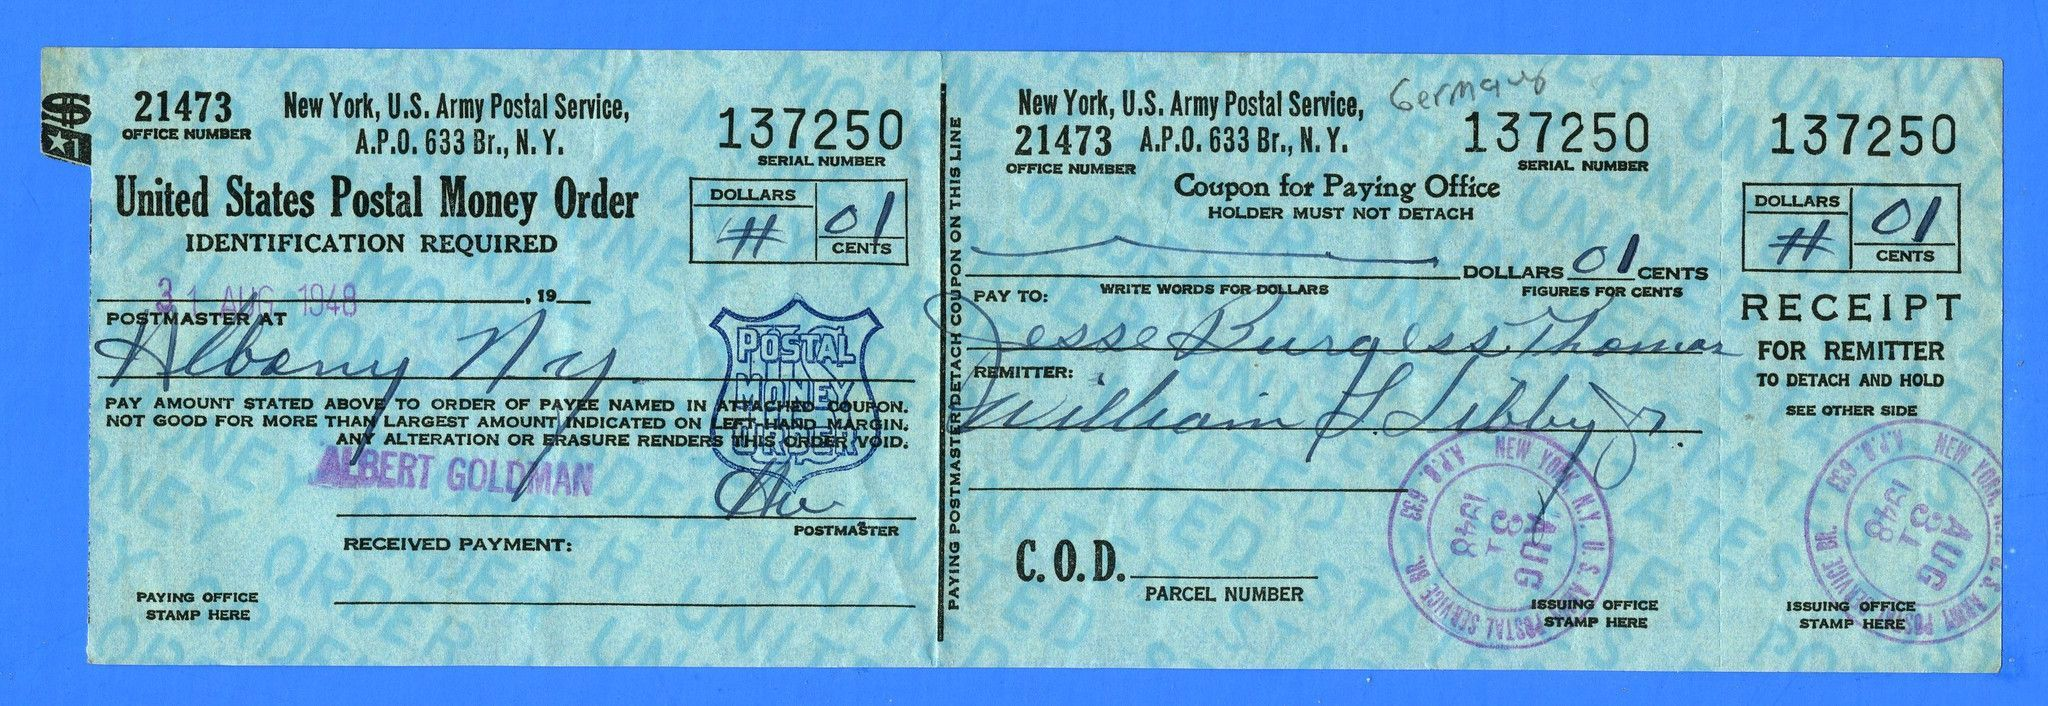 Soldier S Mail Apo 633 Postal Money Order Receipt Wiesbaden Germany August 31 1948 Wiesbaden Money Order Germany